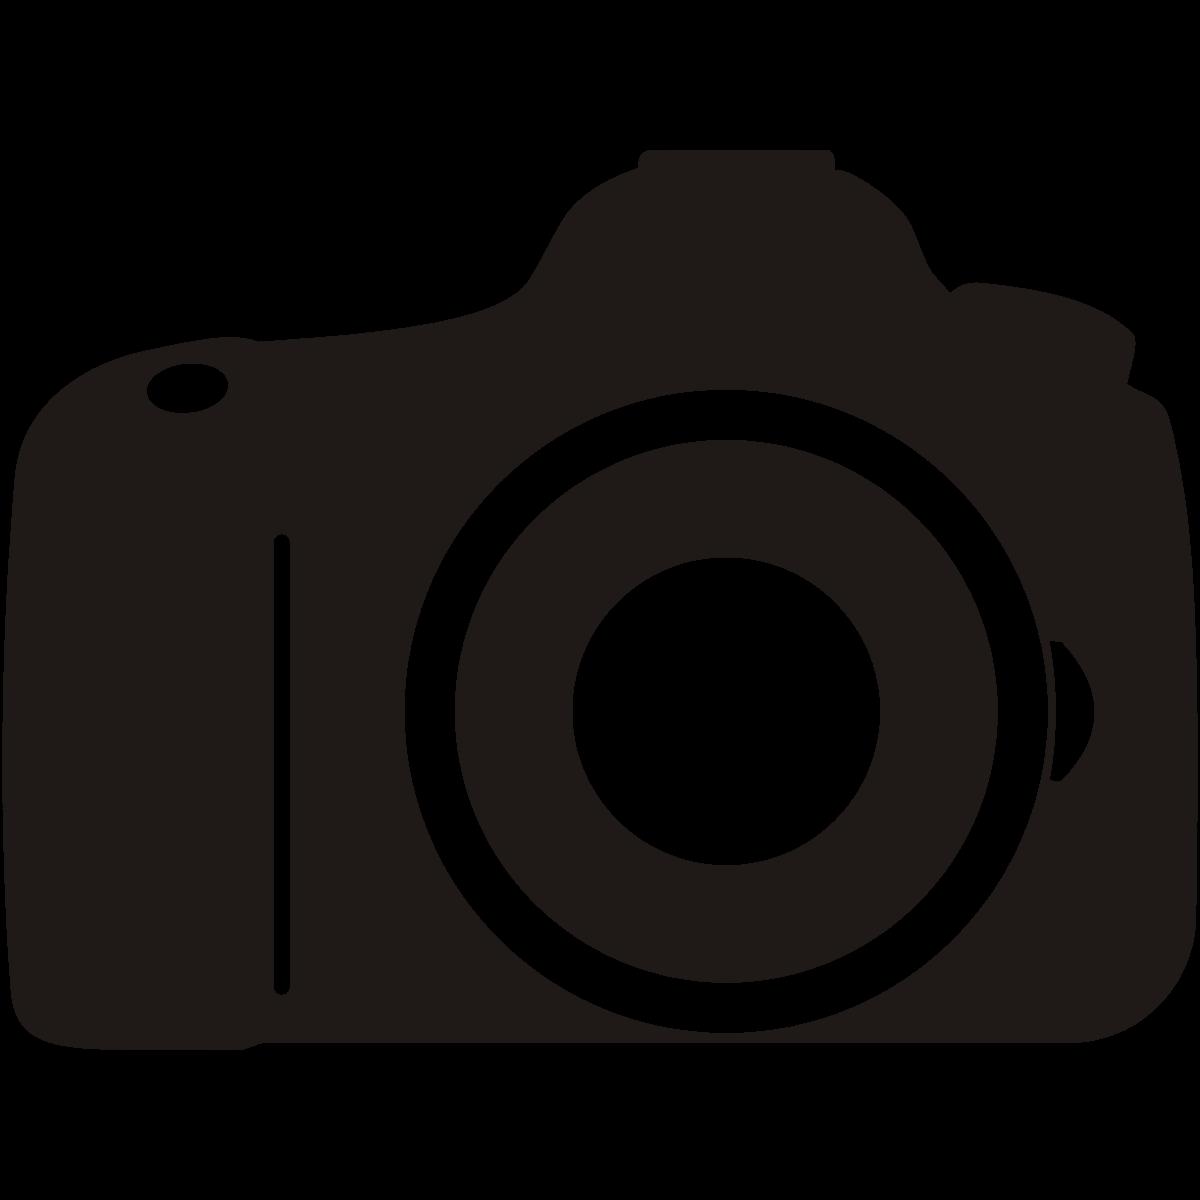 Slr Camera Cliparts   Free download best Slr Camera ...